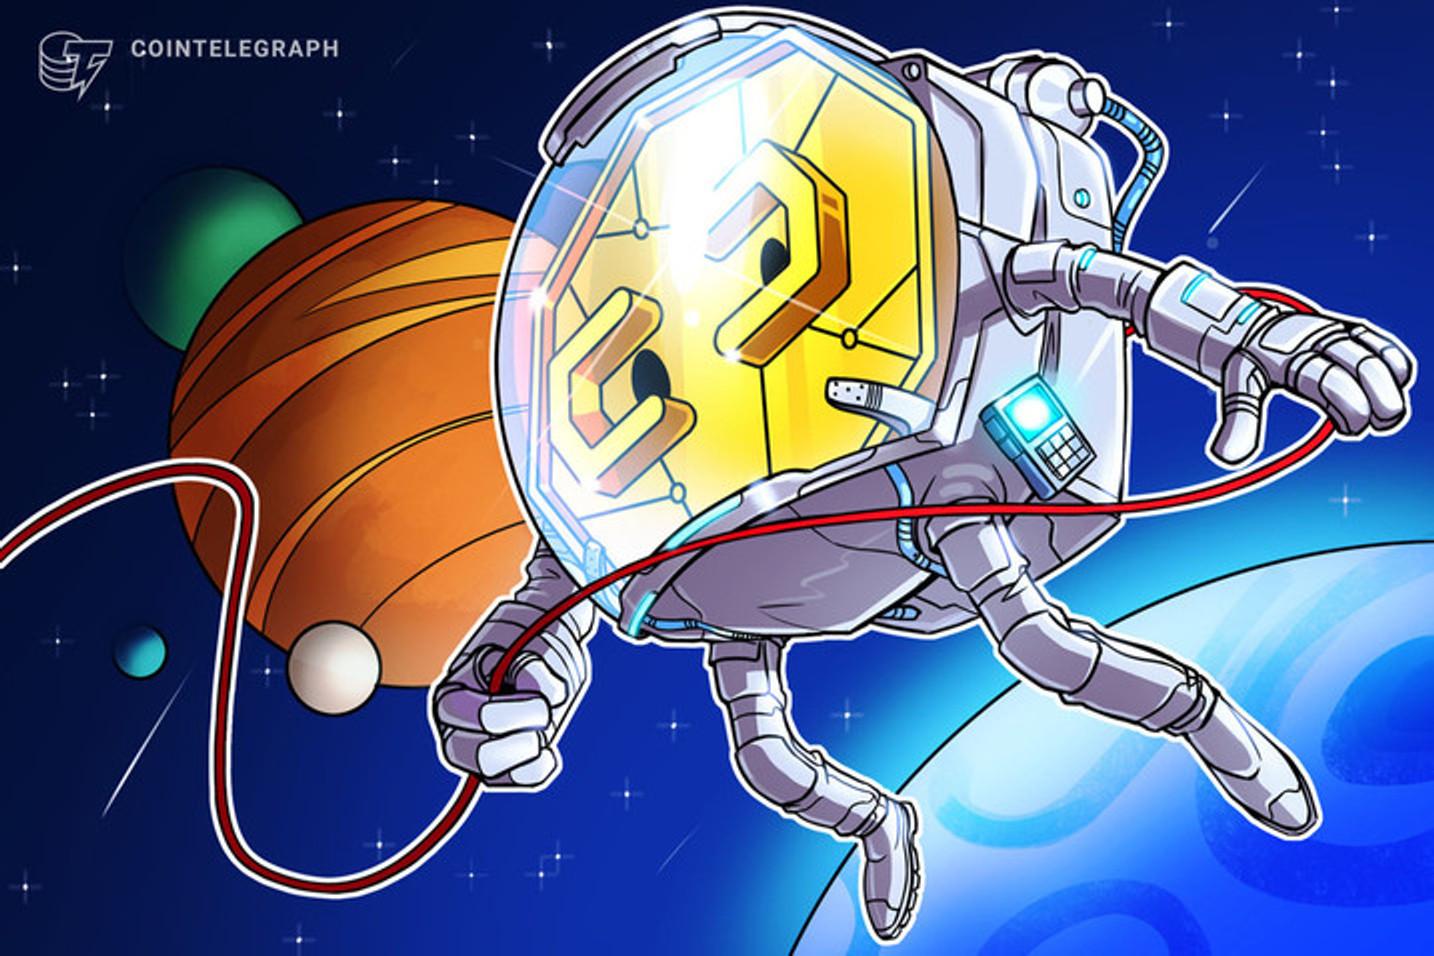 Alta do Bitcoin puxa disparada das altcoins, com 3 tokens subindo até 224%: SHIB, AXS e ICX